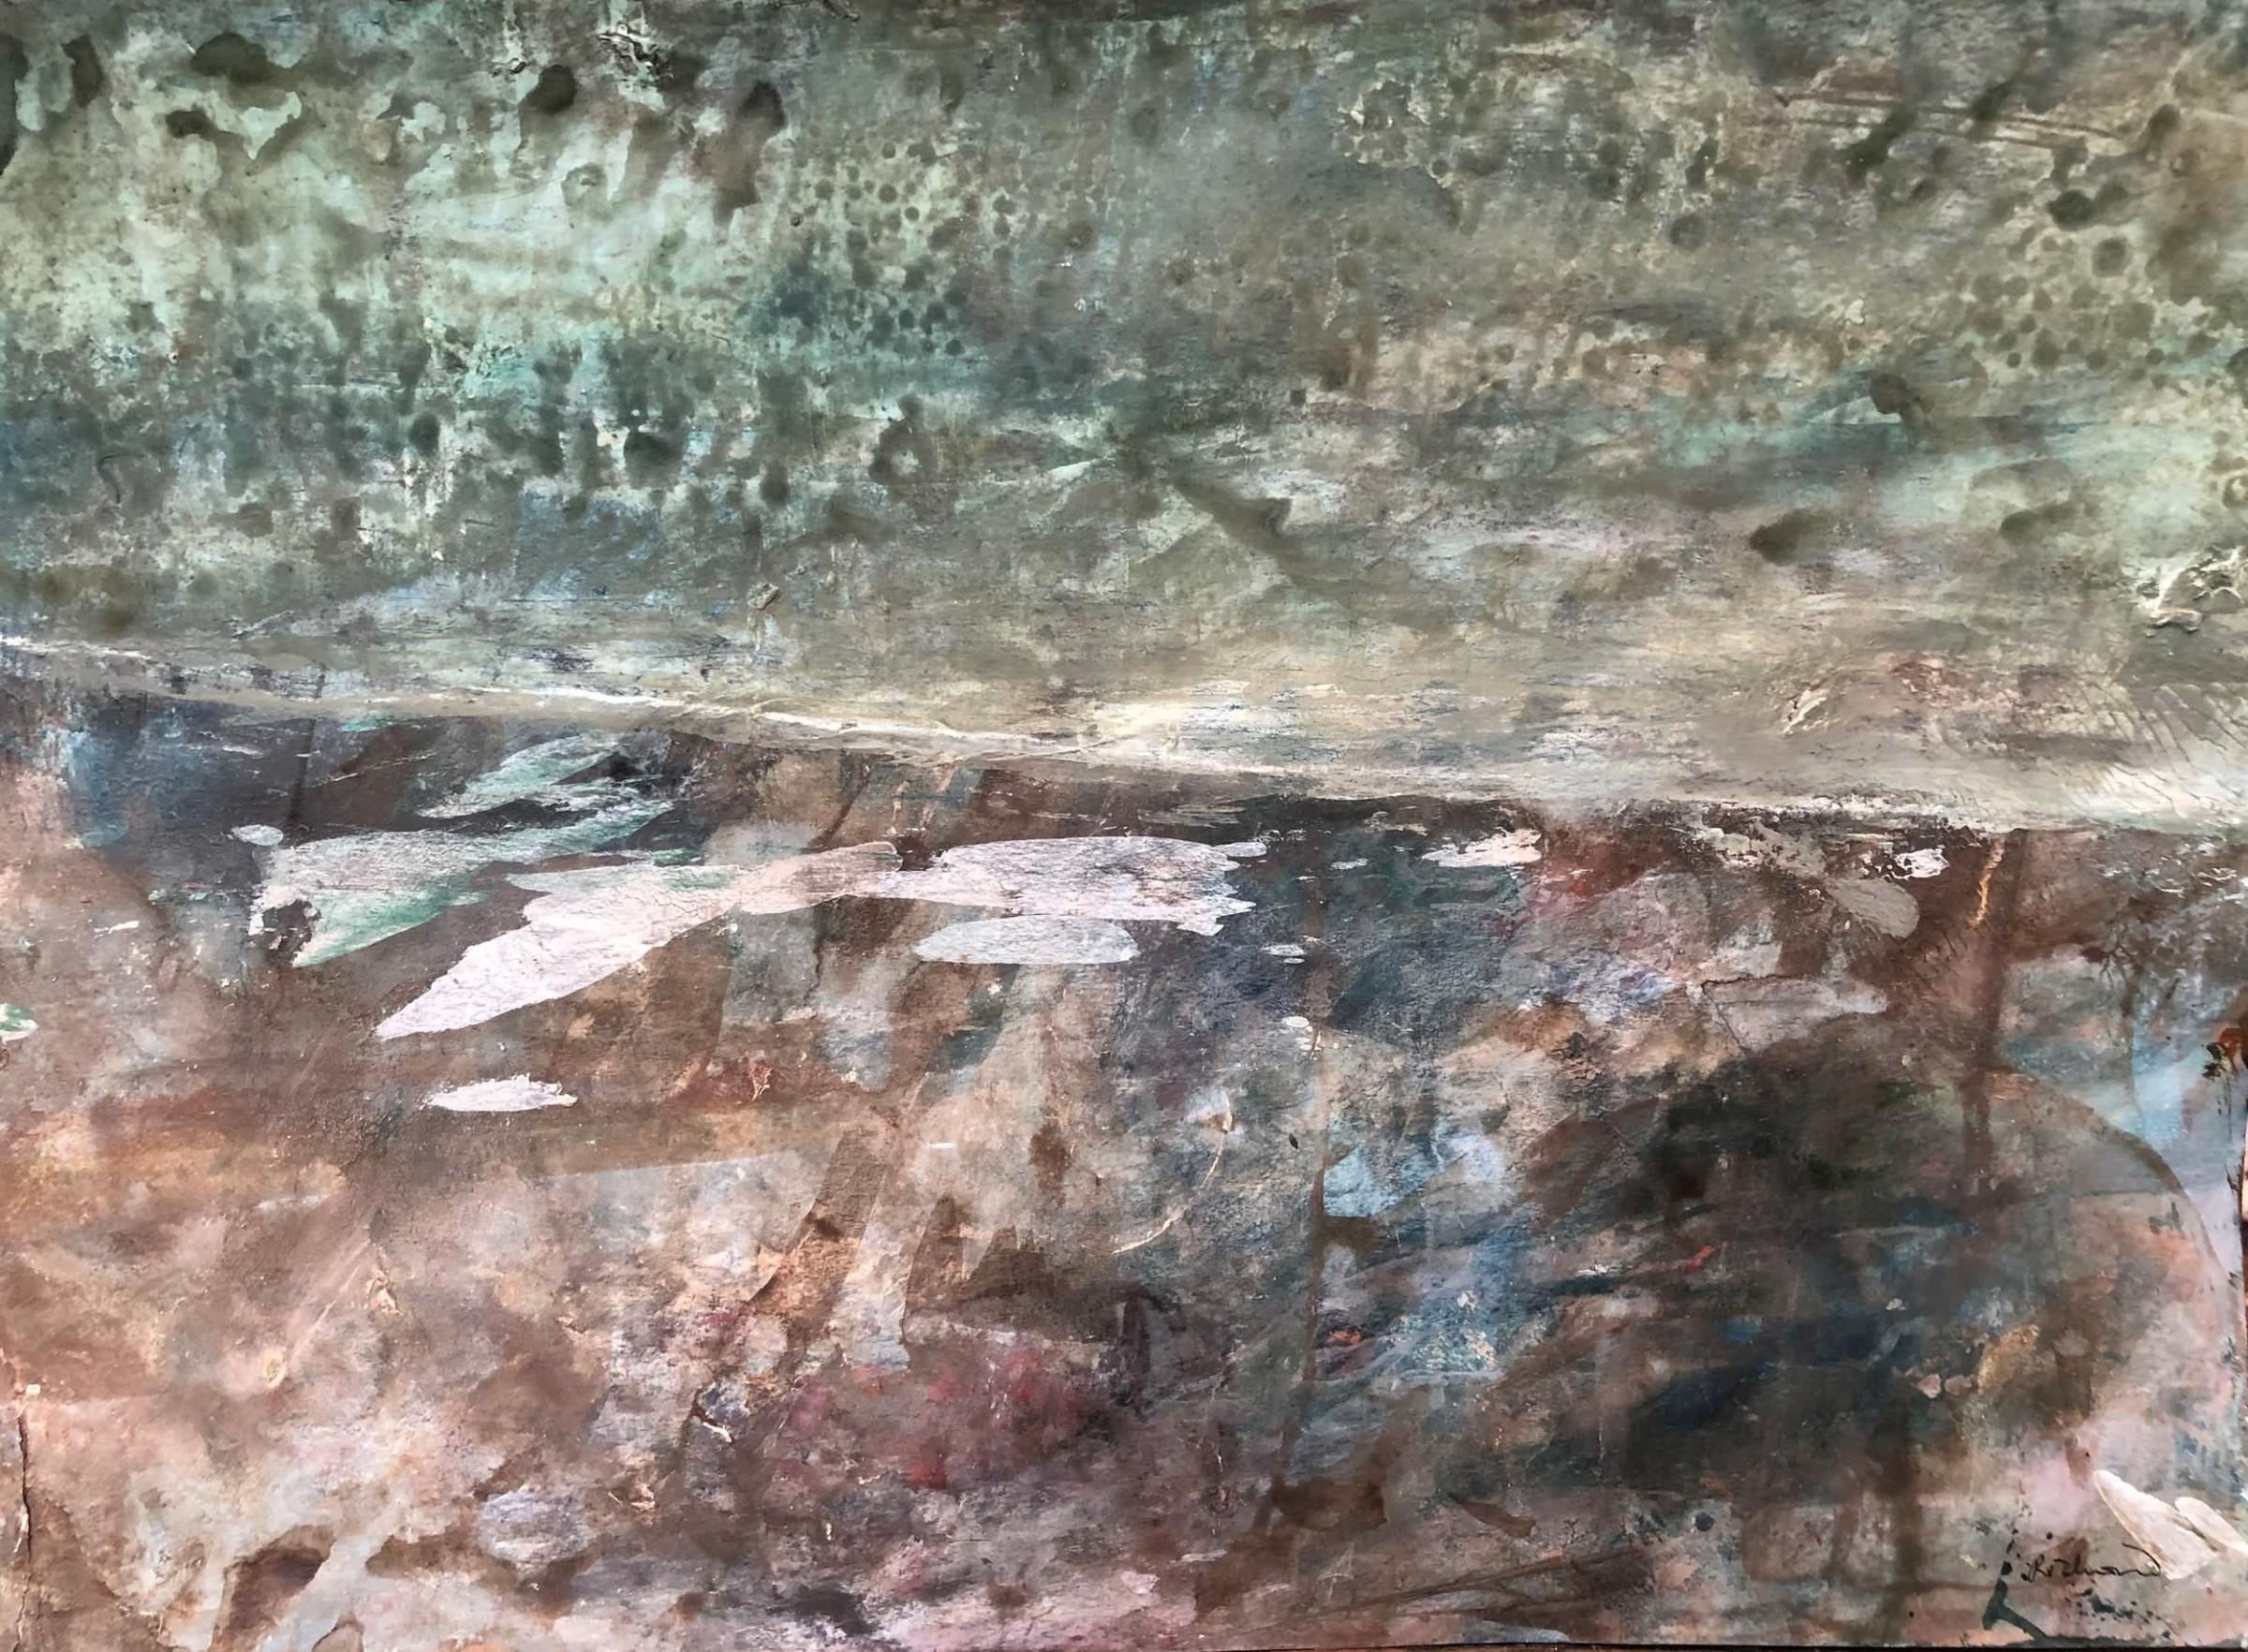 "<span class=""link fancybox-details-link""><a href=""/artists/171-robin-richmond/works/12527-robin-richmond-ice-puddles-and-snowstorm-france/"">View Detail Page</a></span><div class=""artist""><span class=""artist""><strong>Robin Richmond</strong></span></div><div class=""title""><em>Ice Puddles and Snowstorm, France</em></div><div class=""medium"">watercolour</div><div class=""dimensions"">Artwork: 42 x 30cm</div><div class=""price"">£450.00</div>"